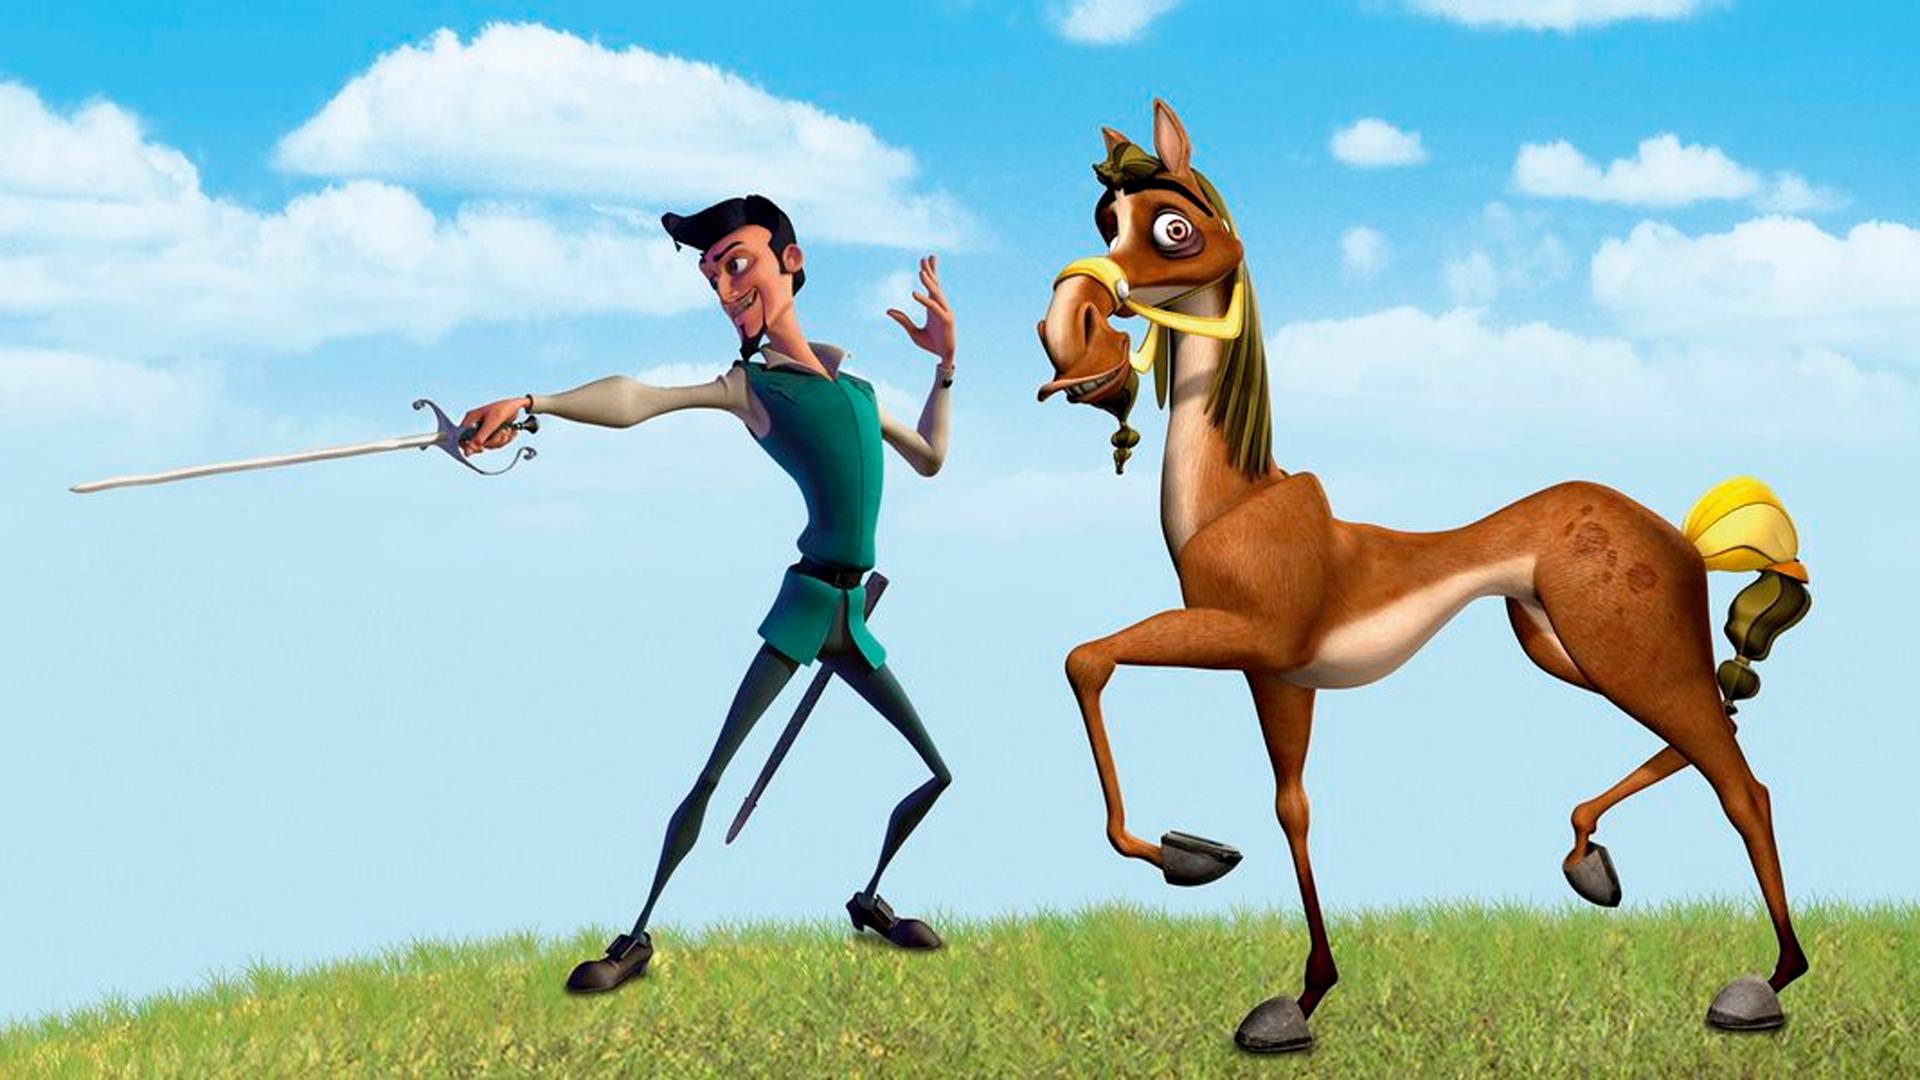 Donkey Xote – Sempre Avantes Covardes